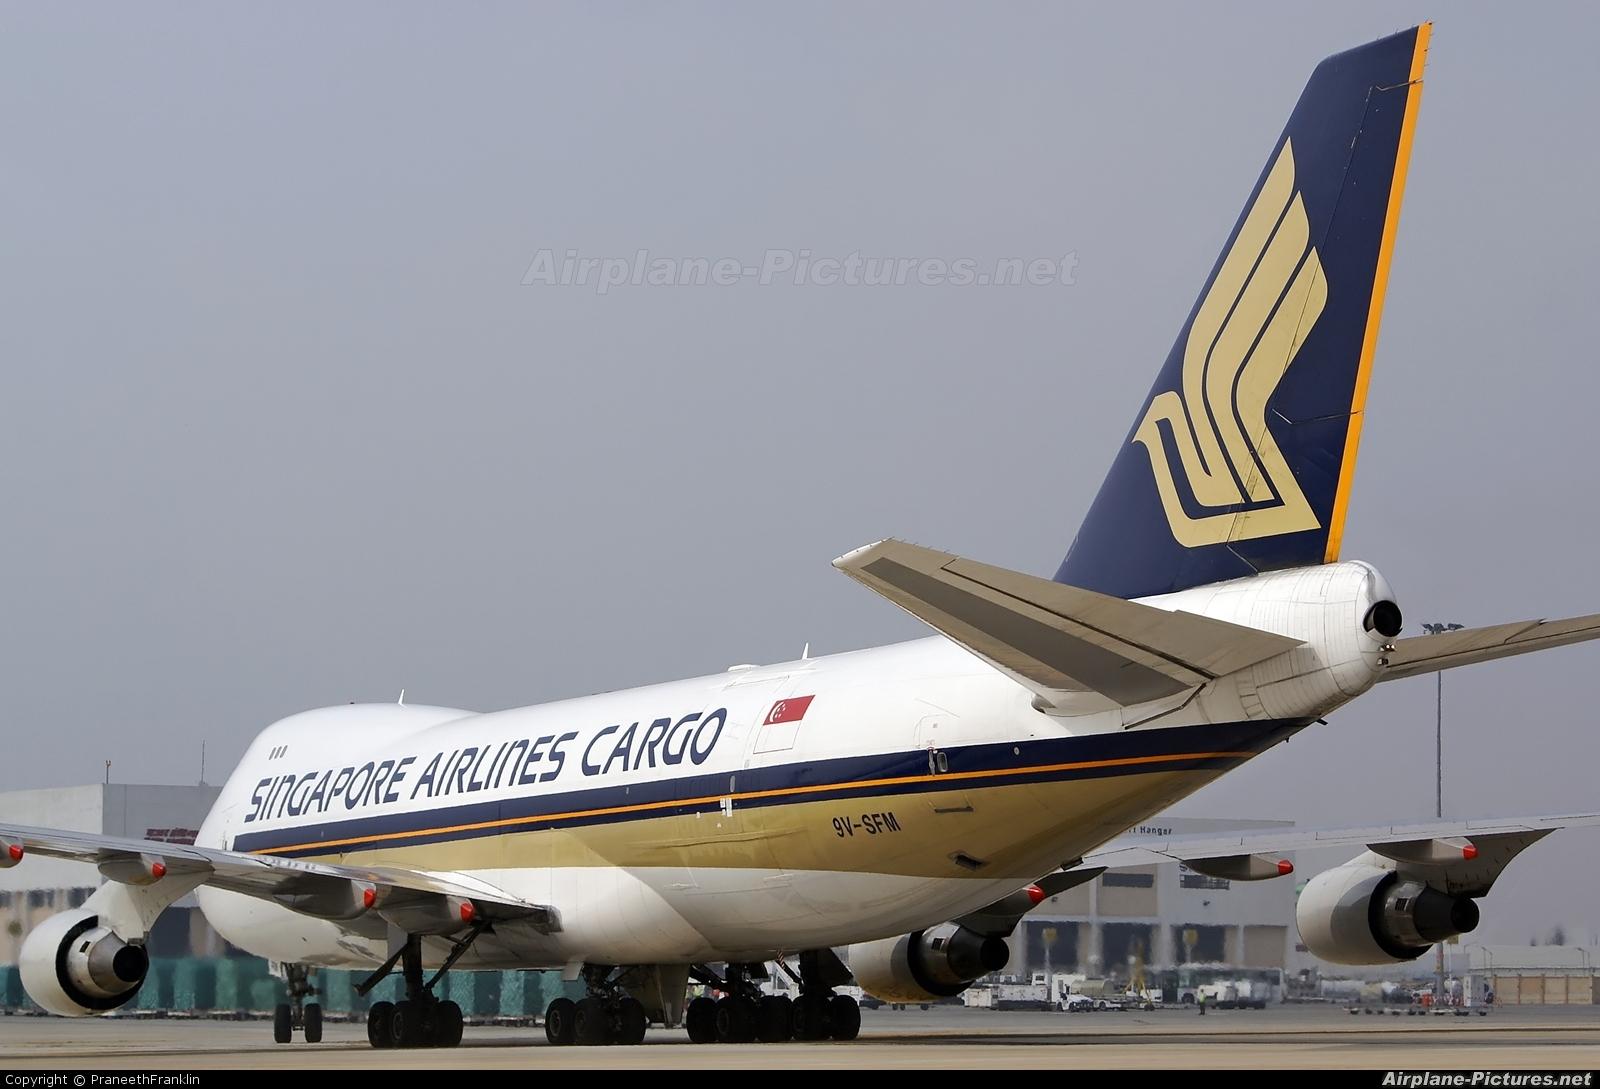 Singapore Airlines Cargo 9V-SFM aircraft at Bangalore - Bengaluru Intl